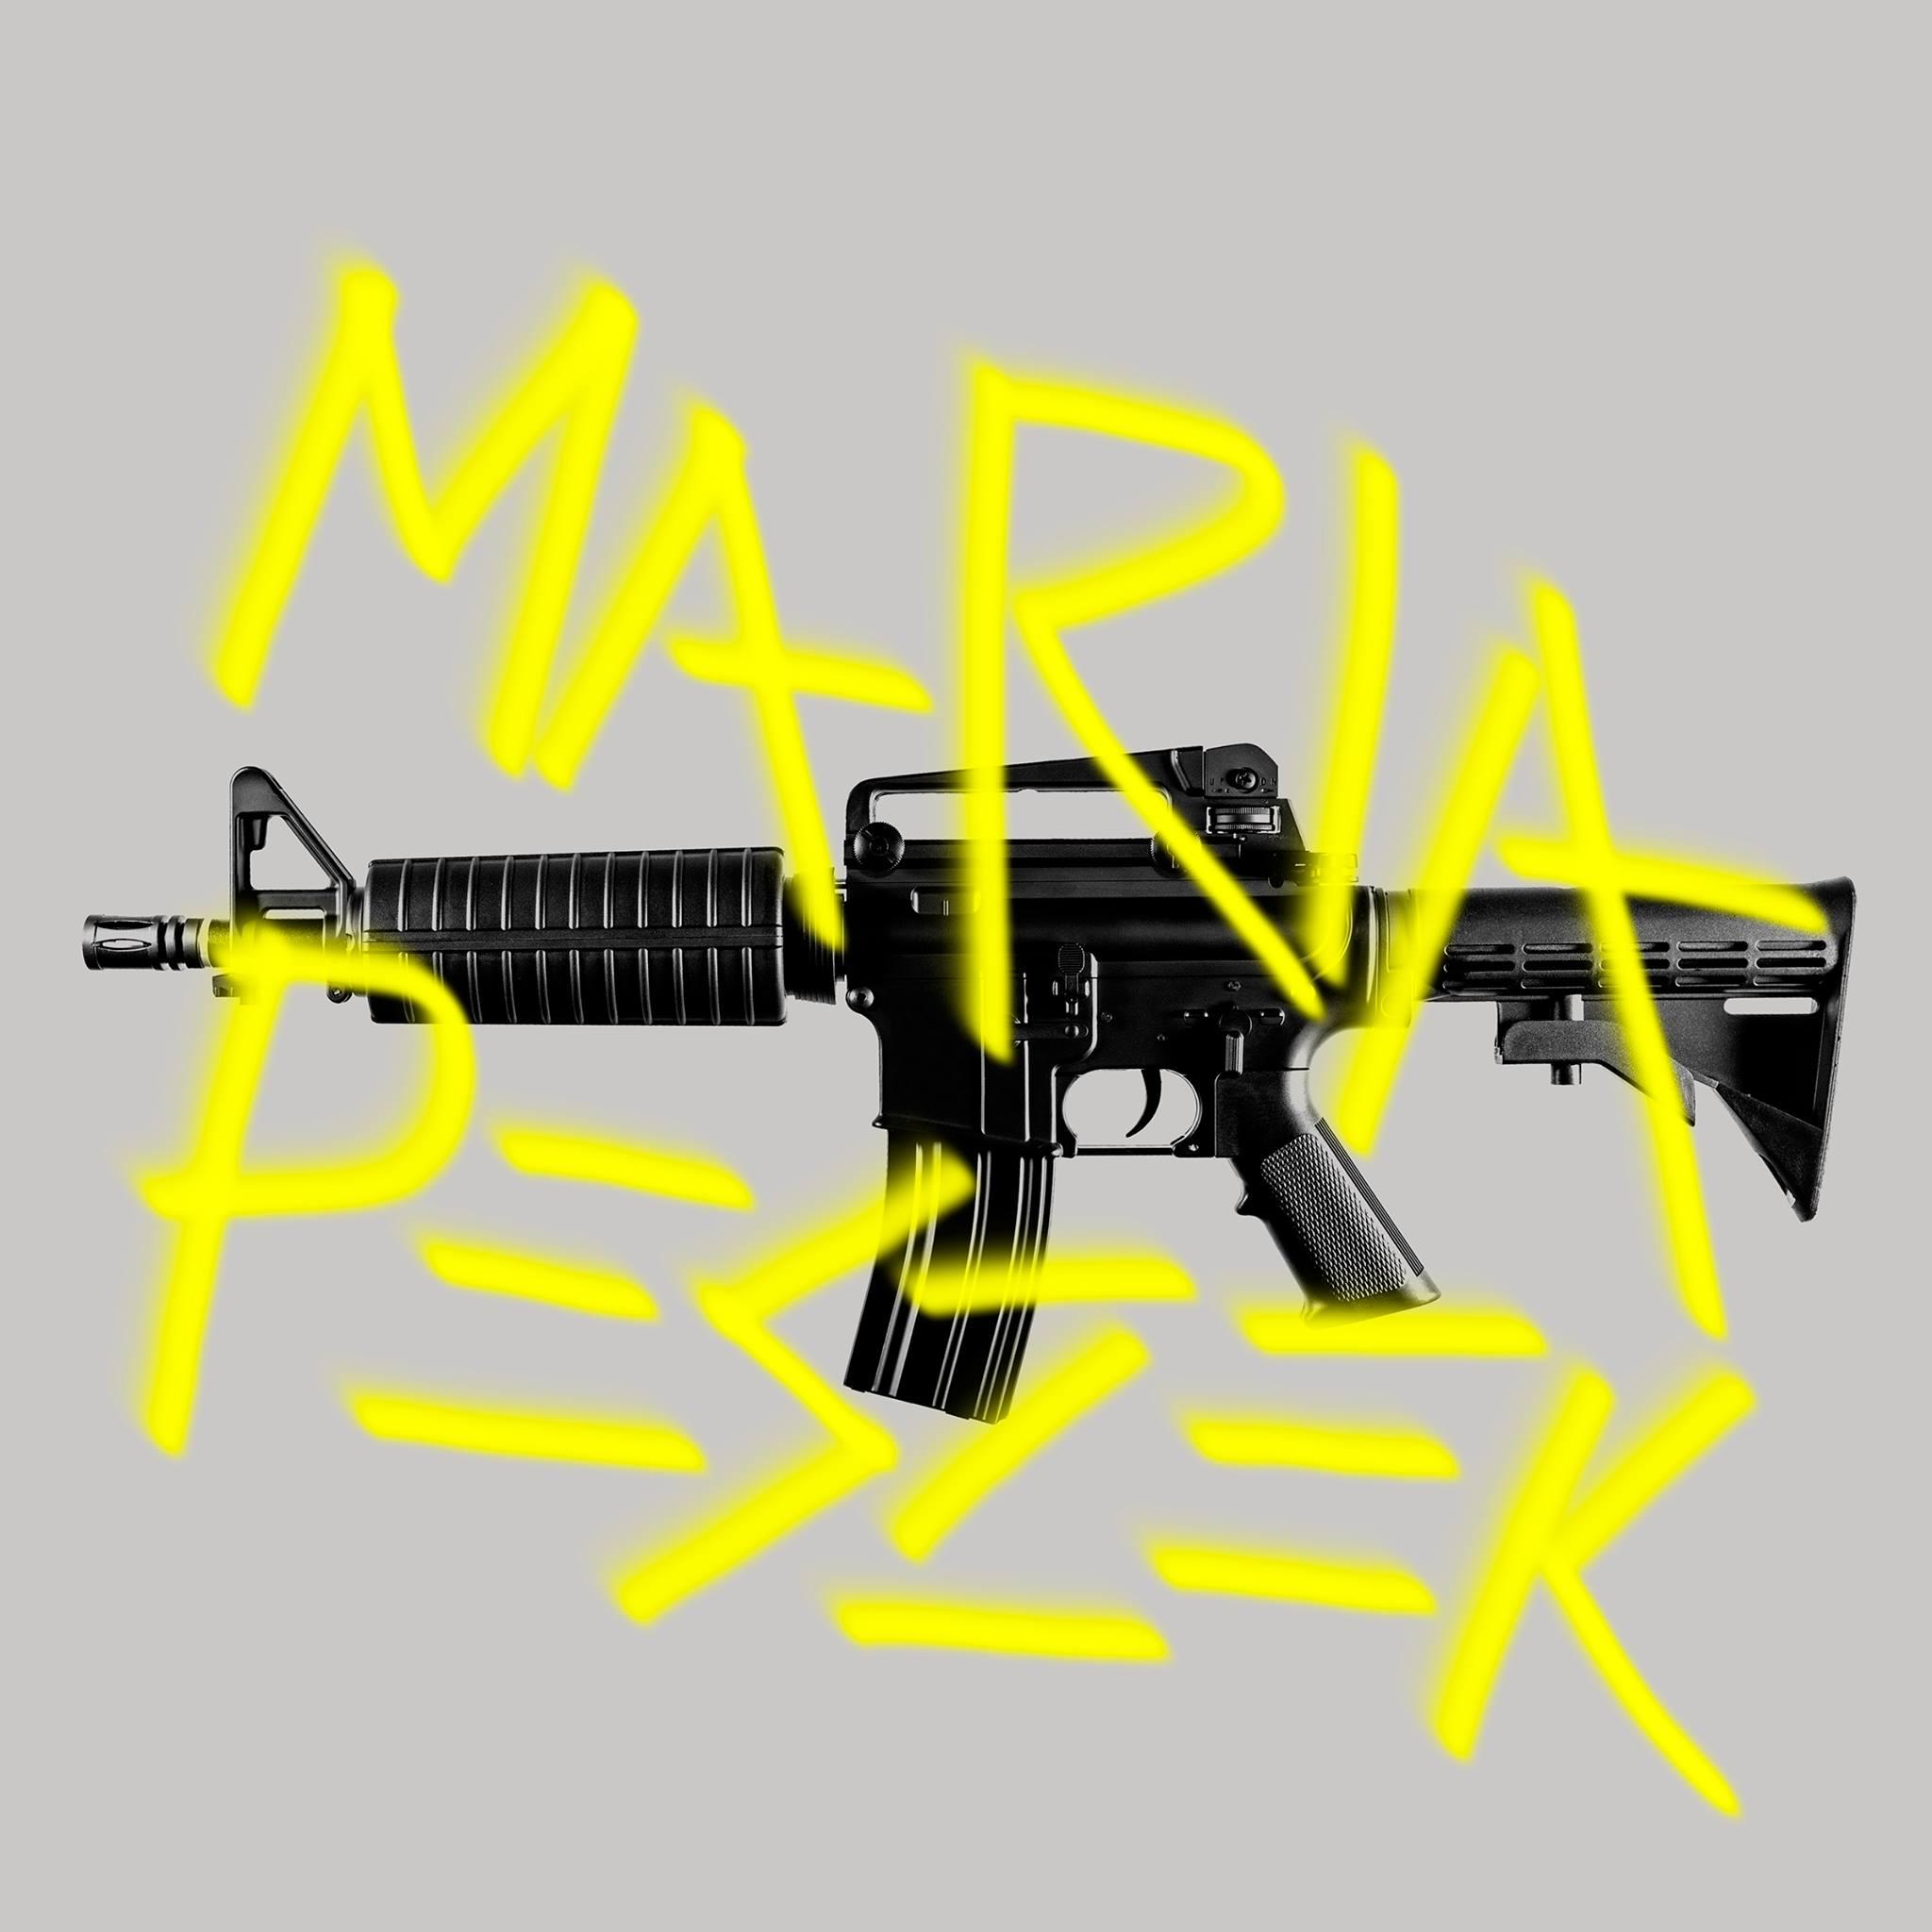 http://allaboutmusic.pl/wp-content/uploads/2016/01/Maria-Peszek-KARABIN.jpg